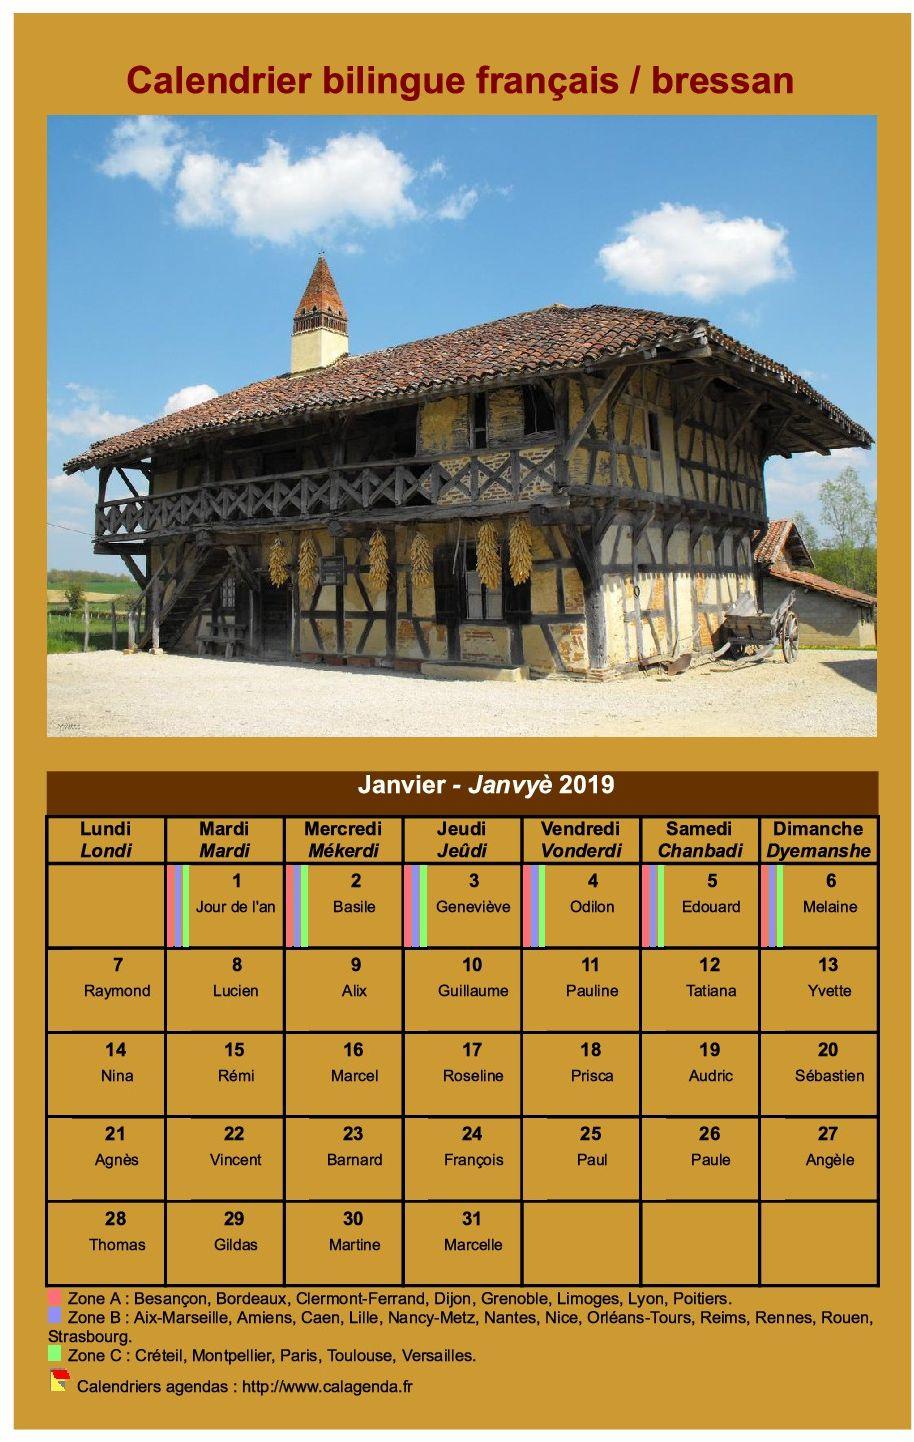 Calendrier mensuel en patois bressan